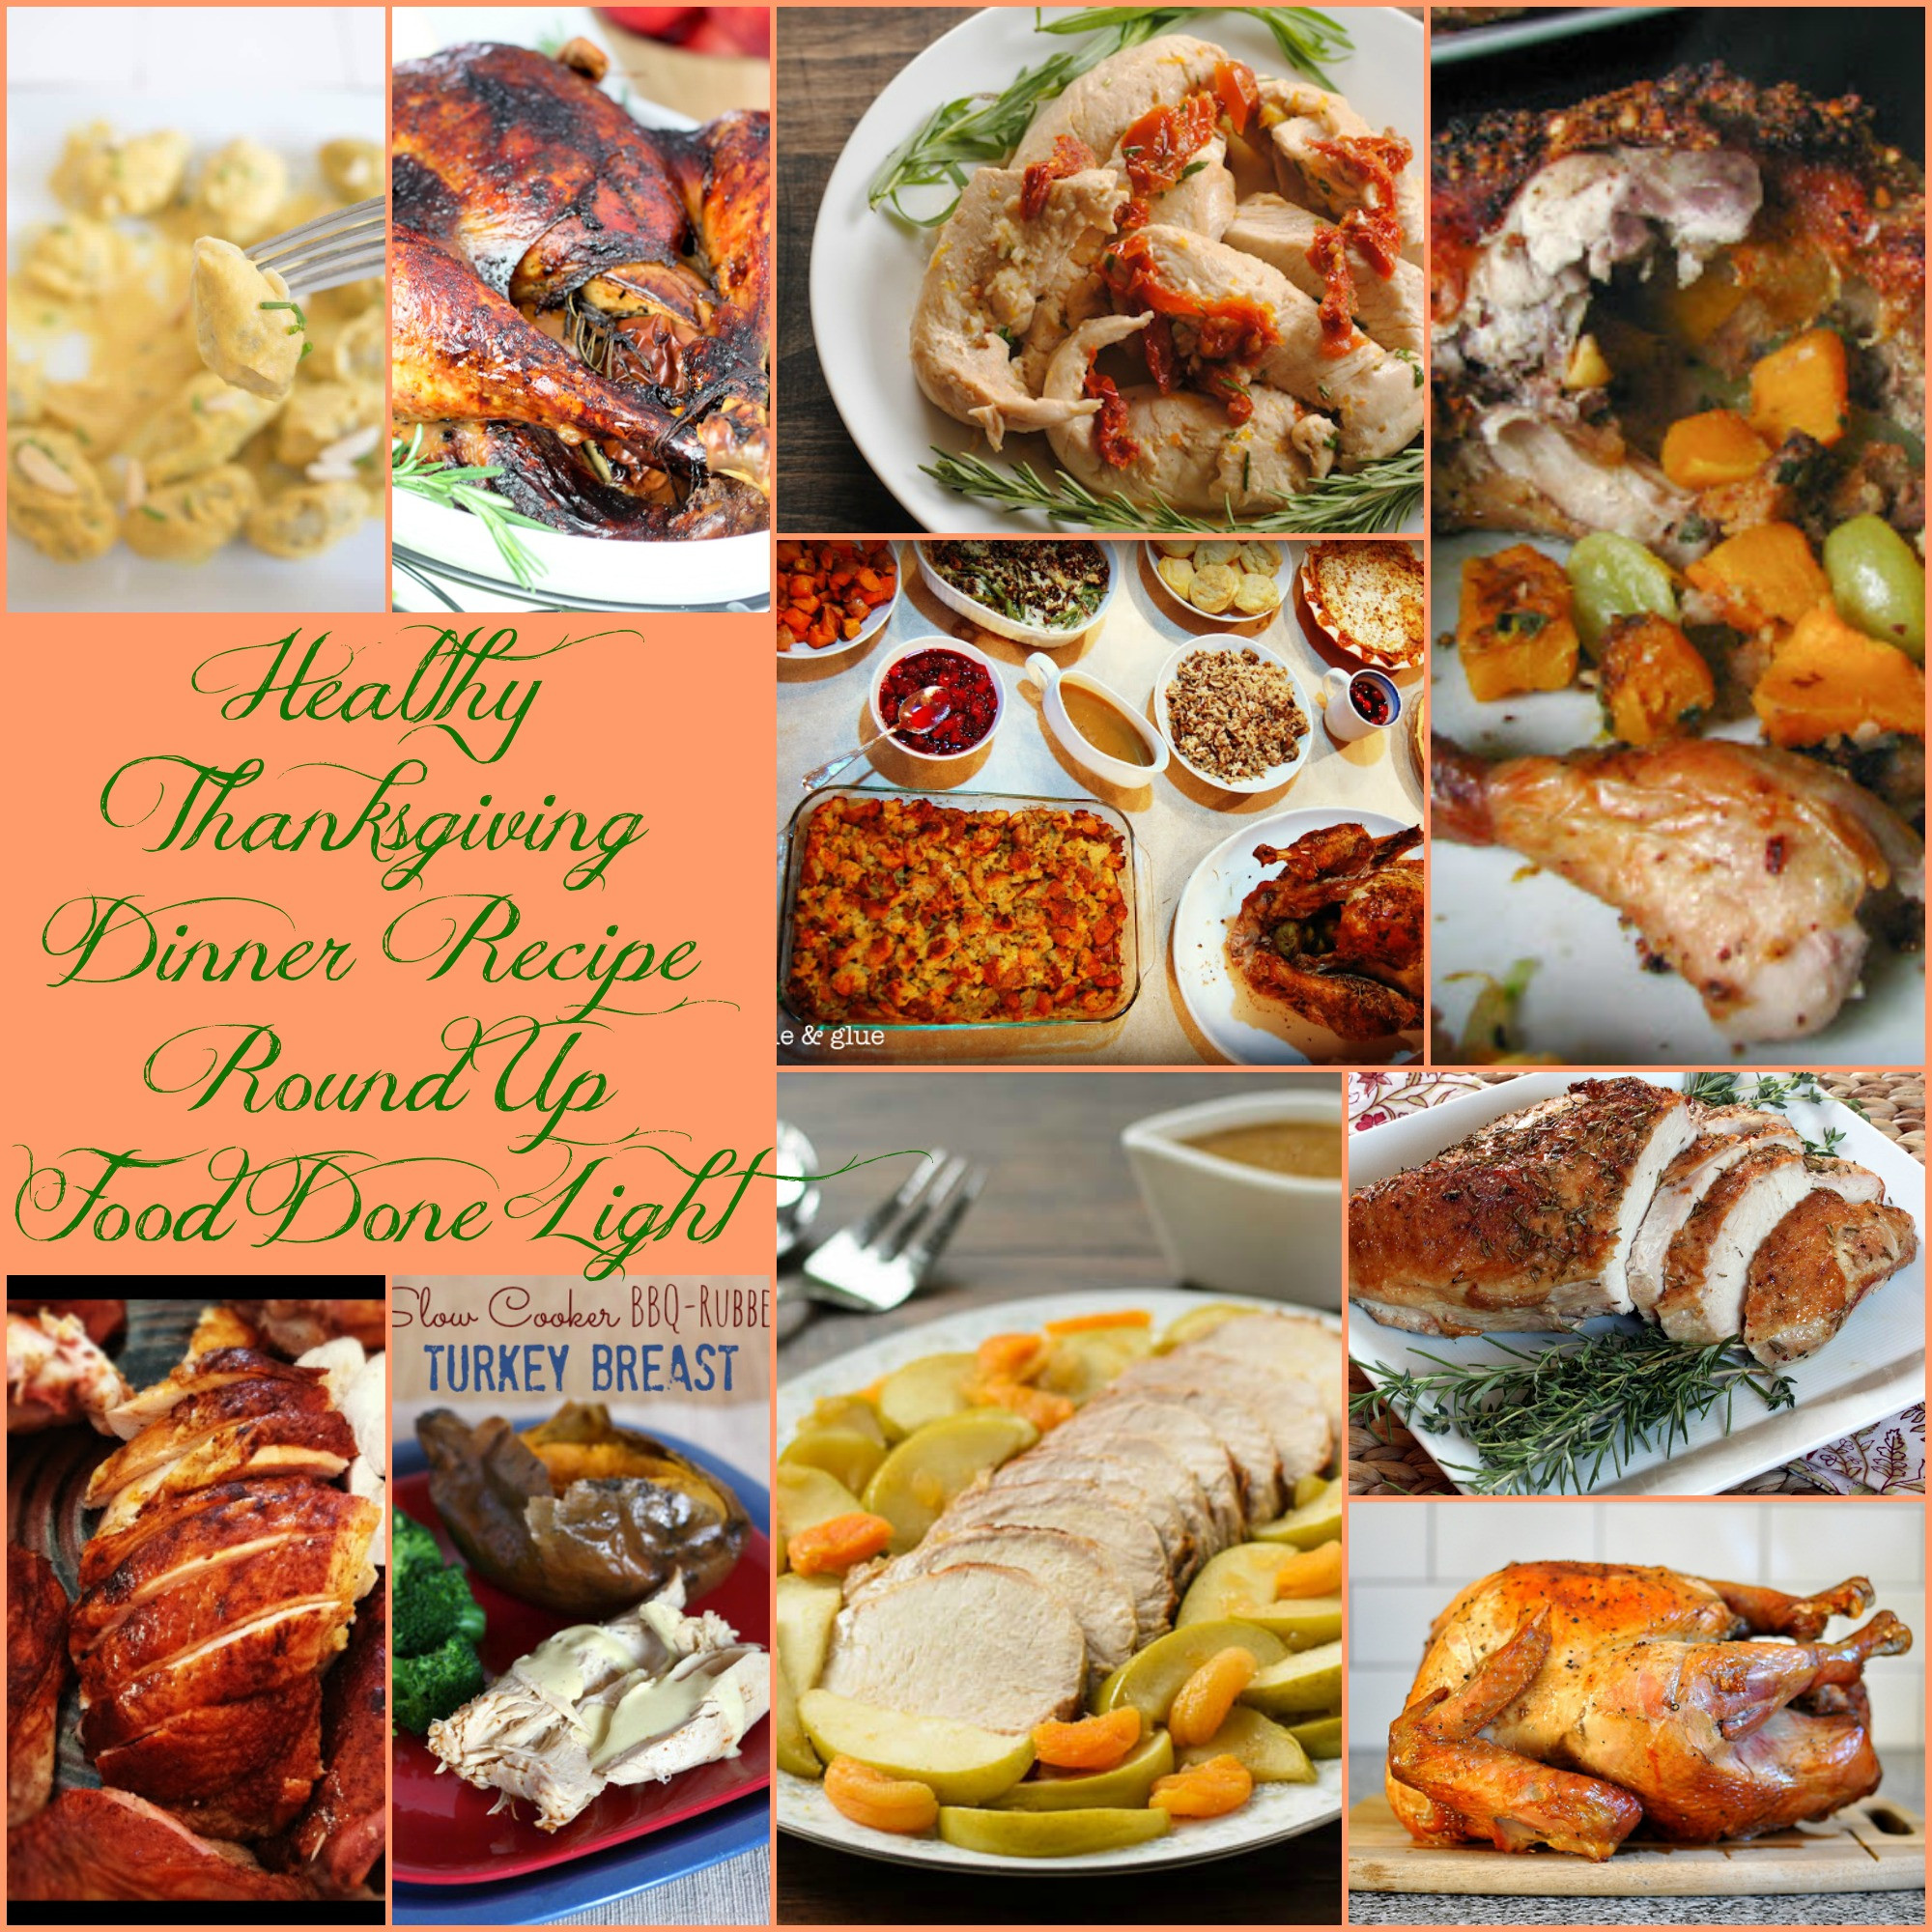 Turkey Recipes For Thanksgiving Dinner  Healthy Thanksgiving Turkey Recipe Round Up Food Done Light